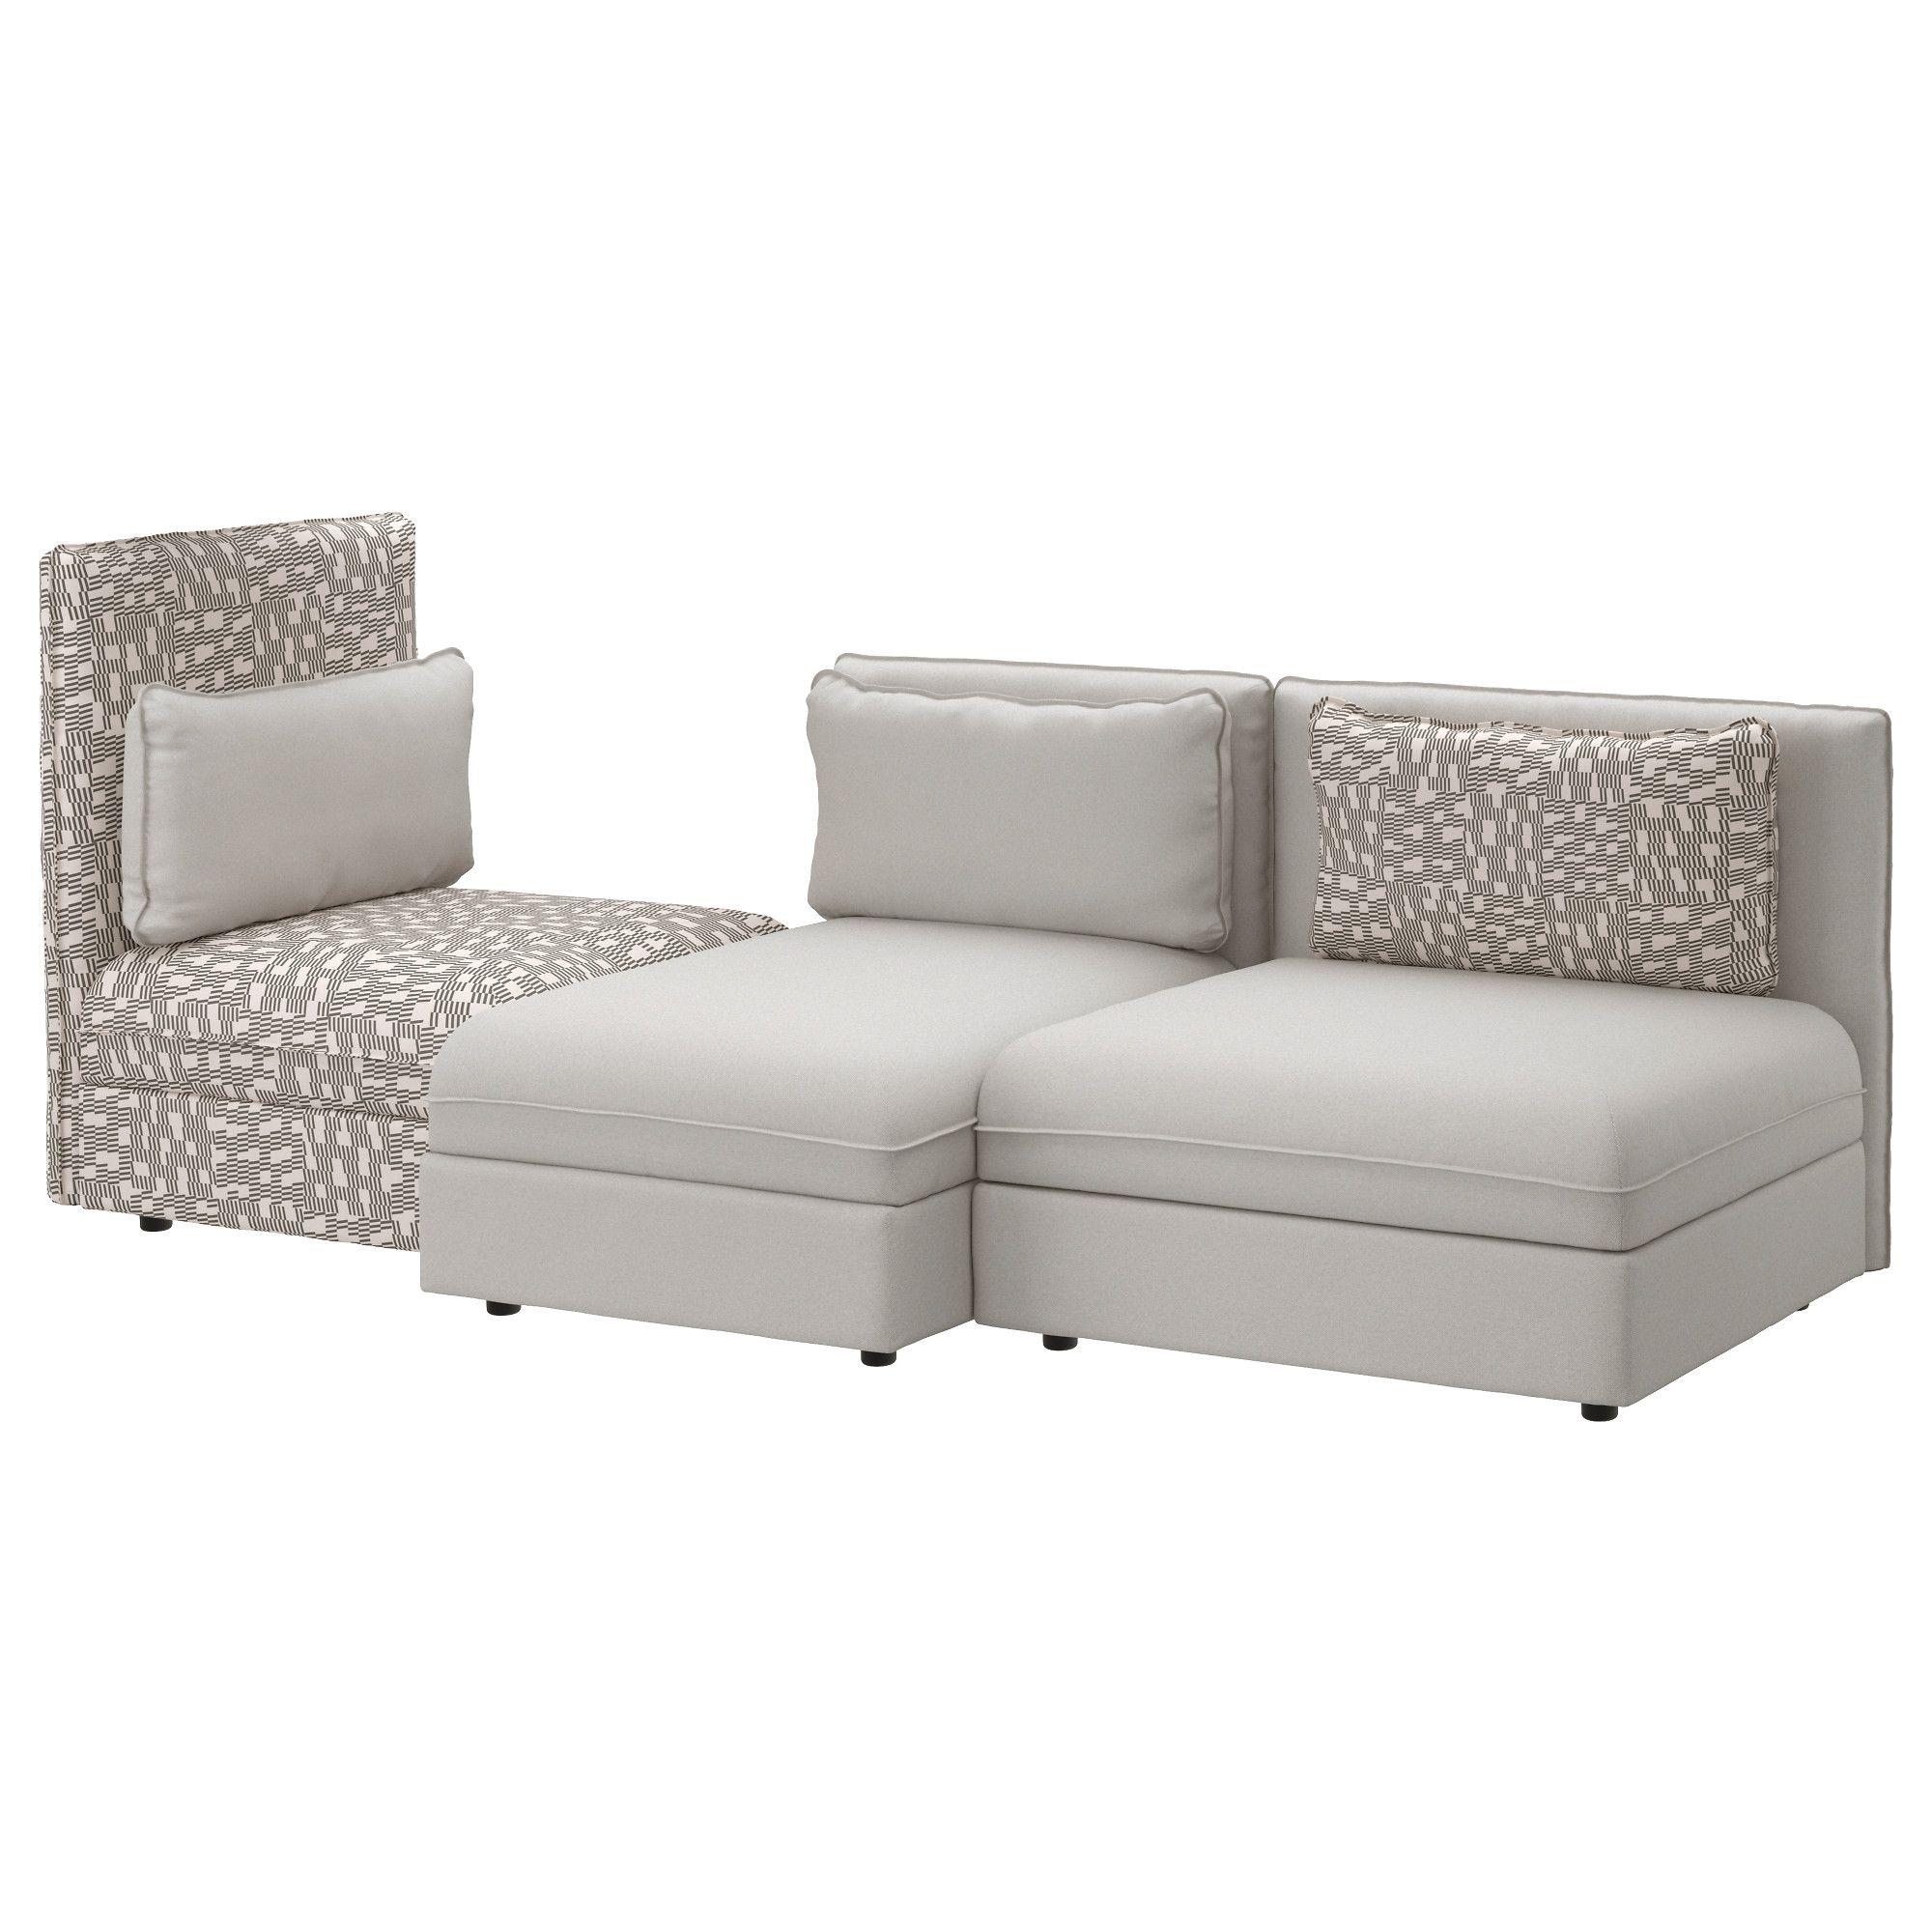 Vallentuna Fabric Sofas Ikea Fabric Sofa Modular Sectional Sofa Sectional Sofa